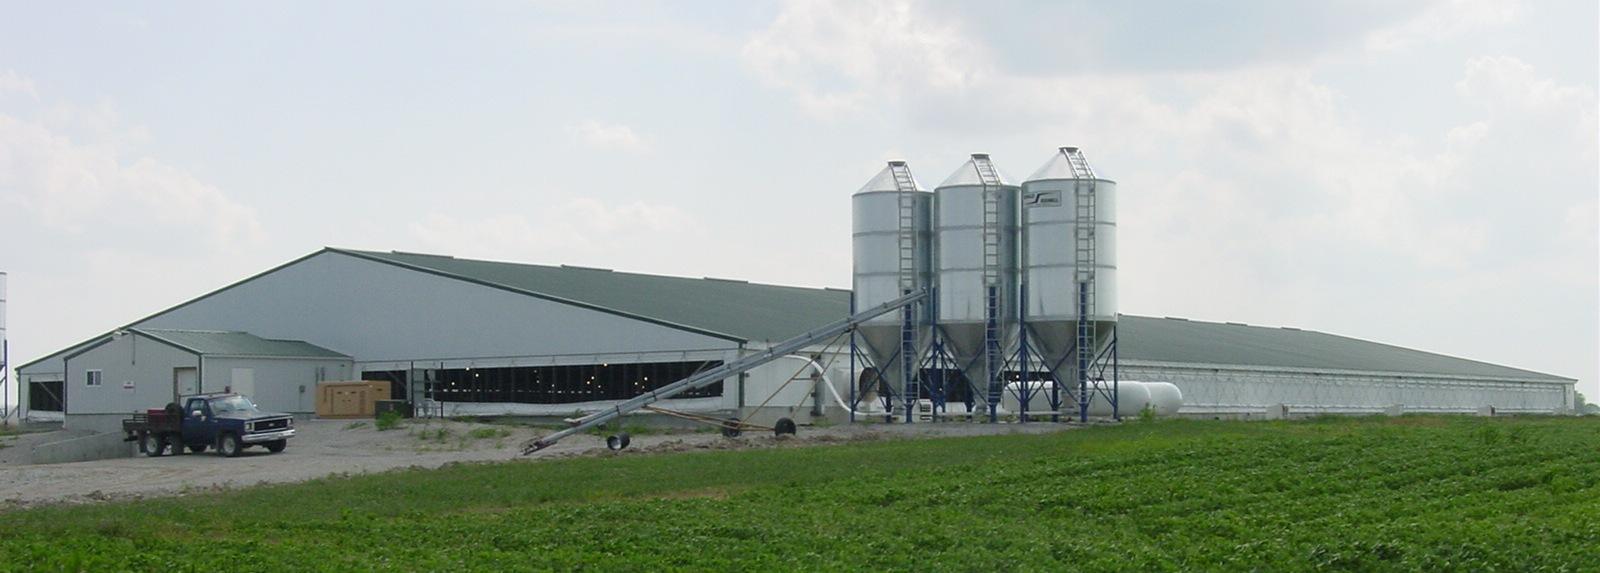 Factory Farm Or Family